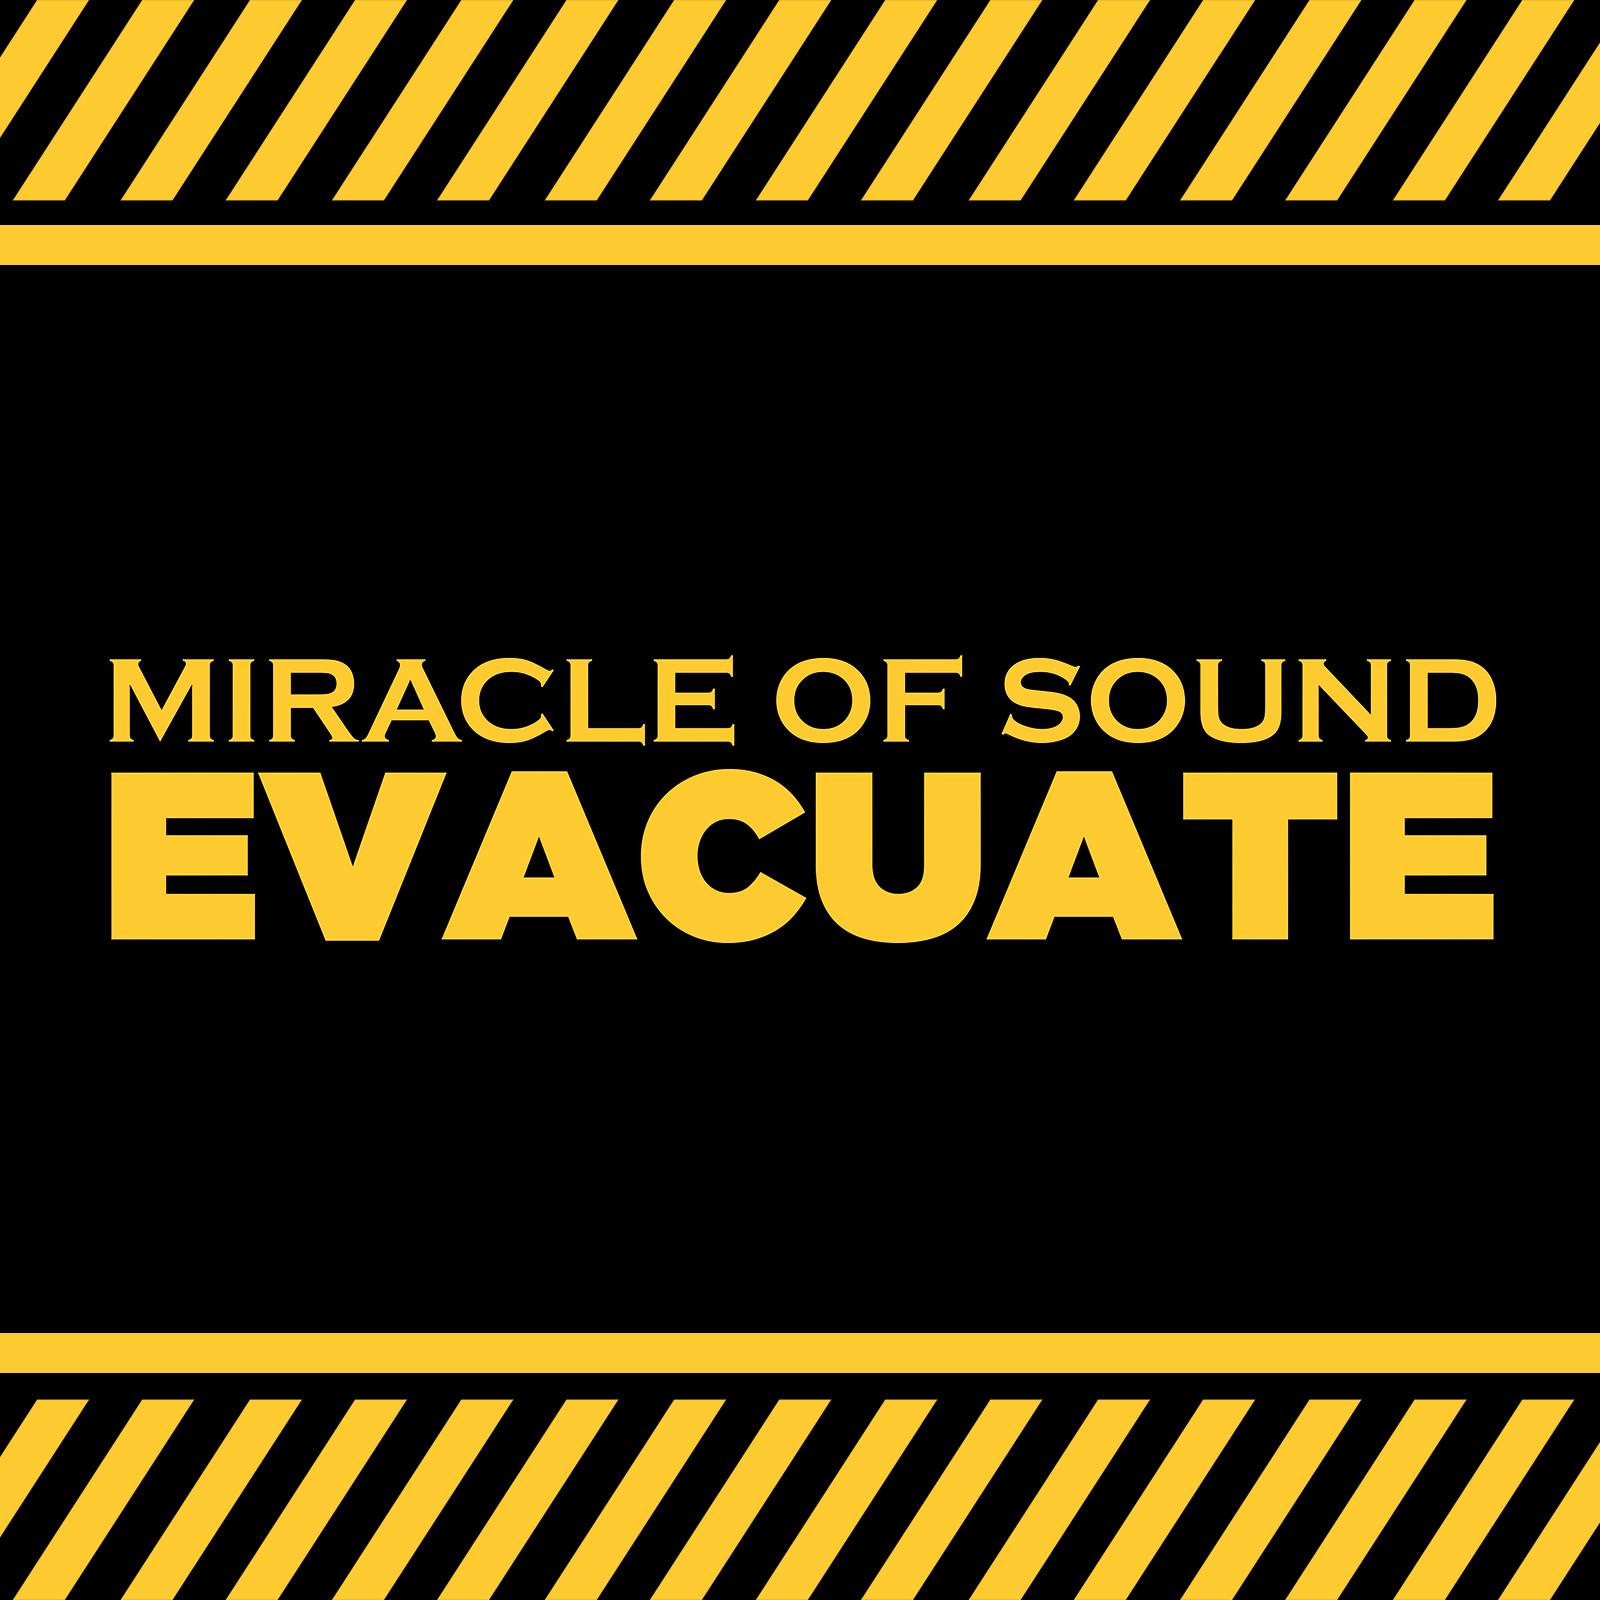 Alfred khamidullin evacuate2 s